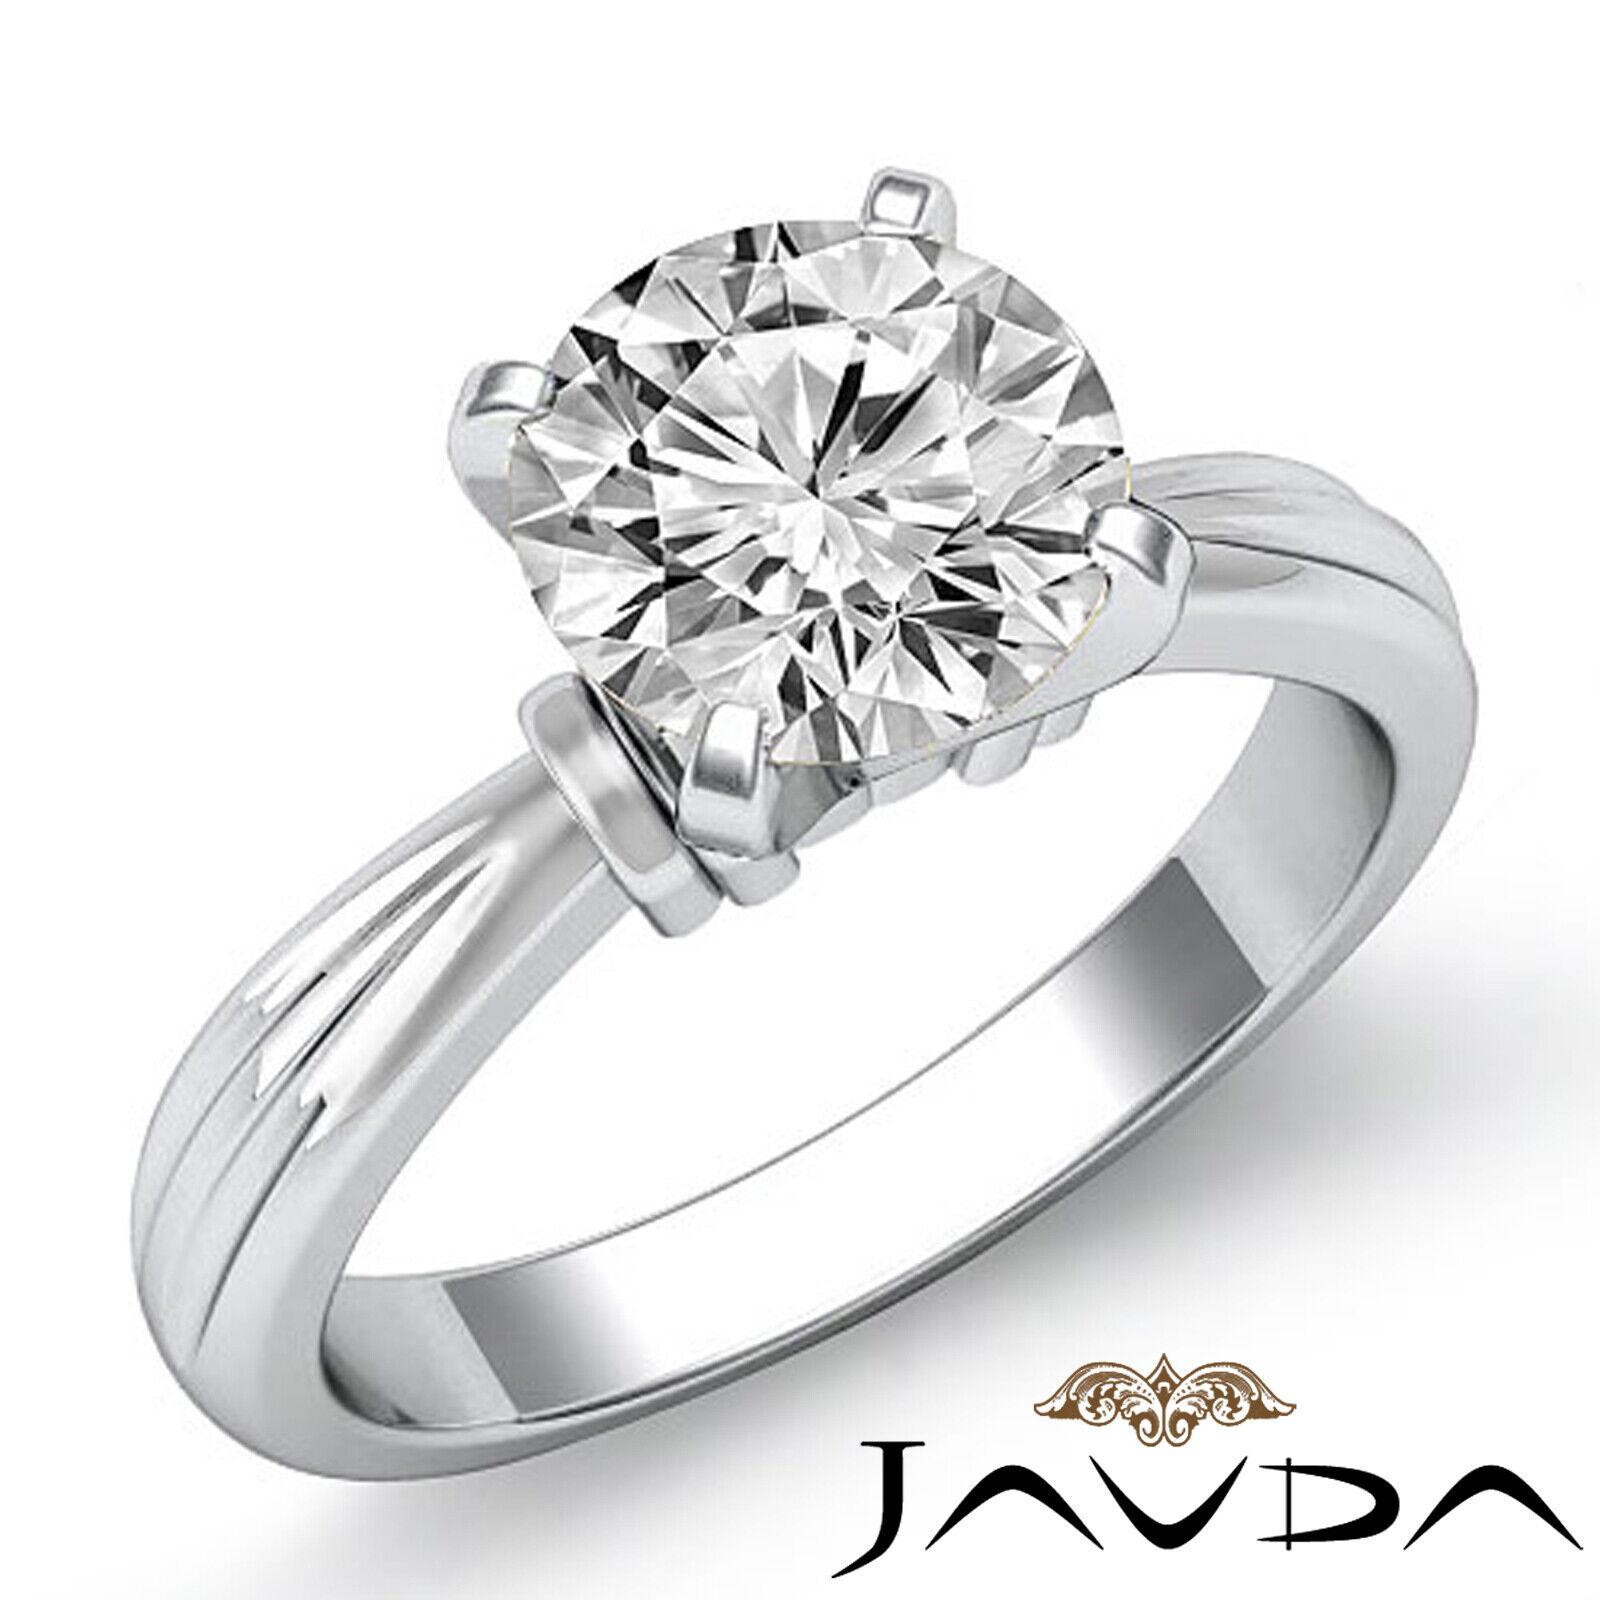 Round Solitaire Natural GIA H Color VVS2 Diamond Women's Engagement Ring 1 ctw.